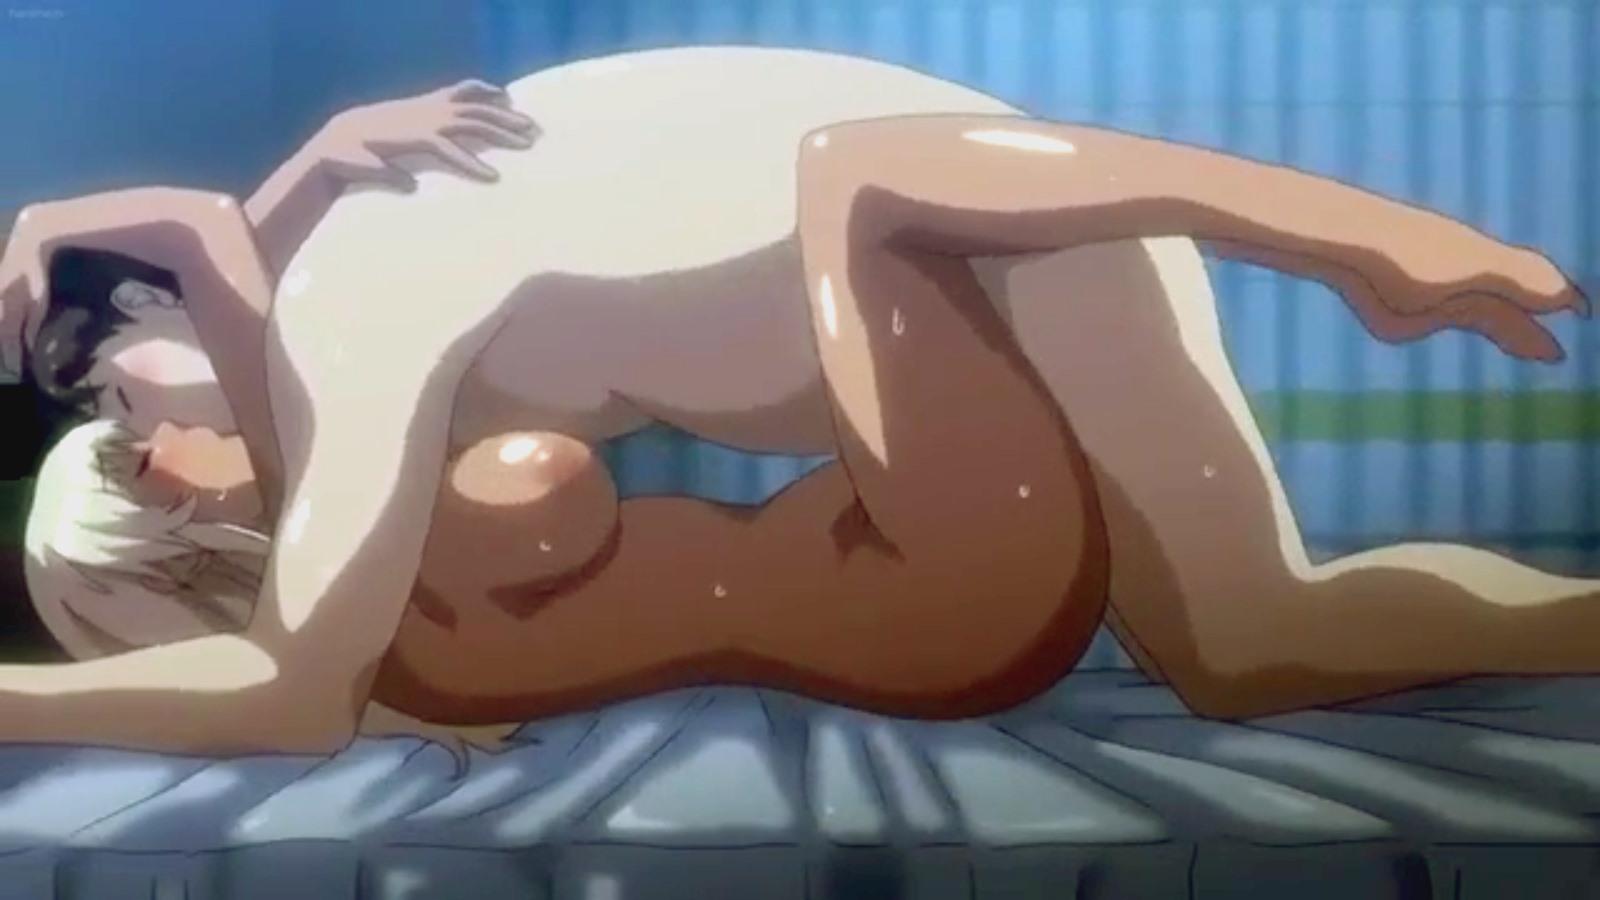 Anime Her Porn baka dakedo 2 | shiinea chieri cartoon porn anime video